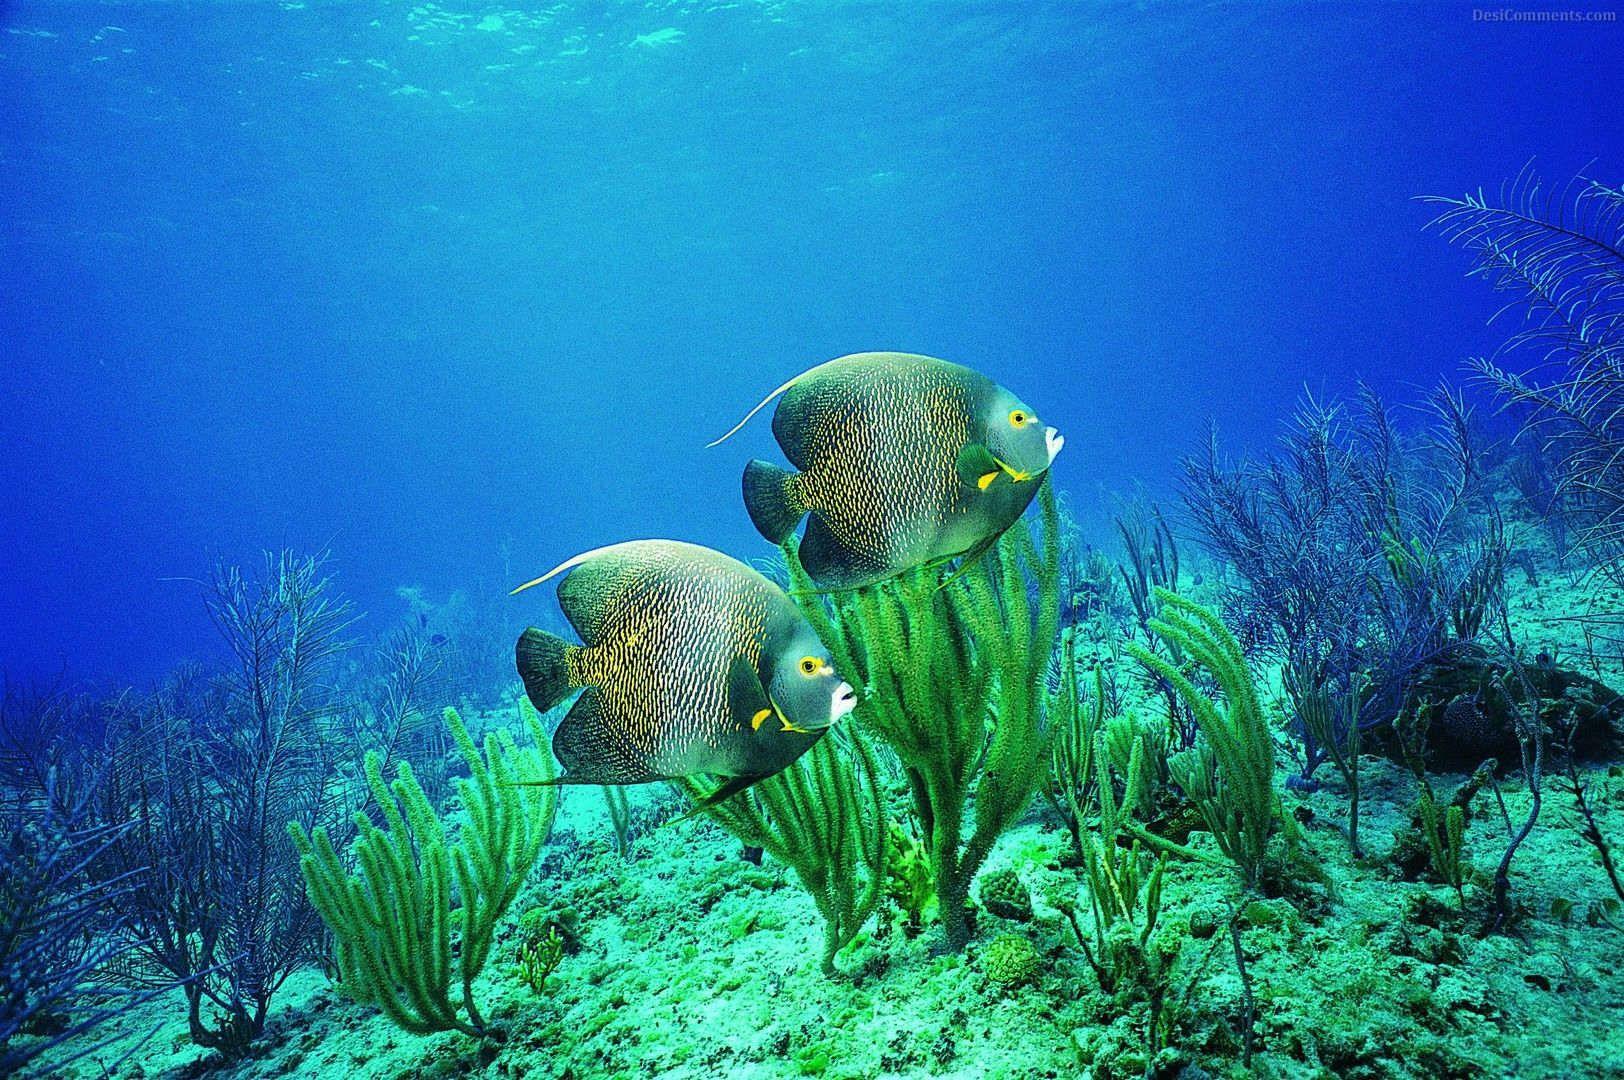 Underwater Underwater Photography Paradise Ocean